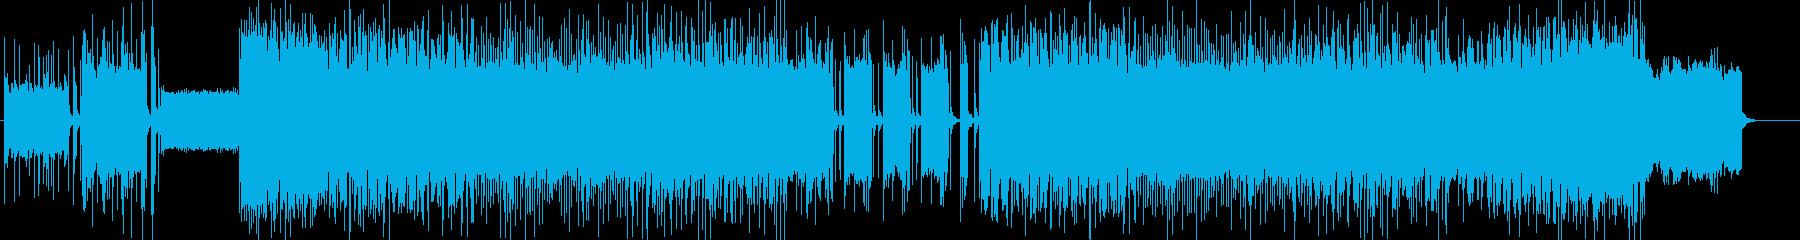 「DARK・DEATH」BGM223の再生済みの波形